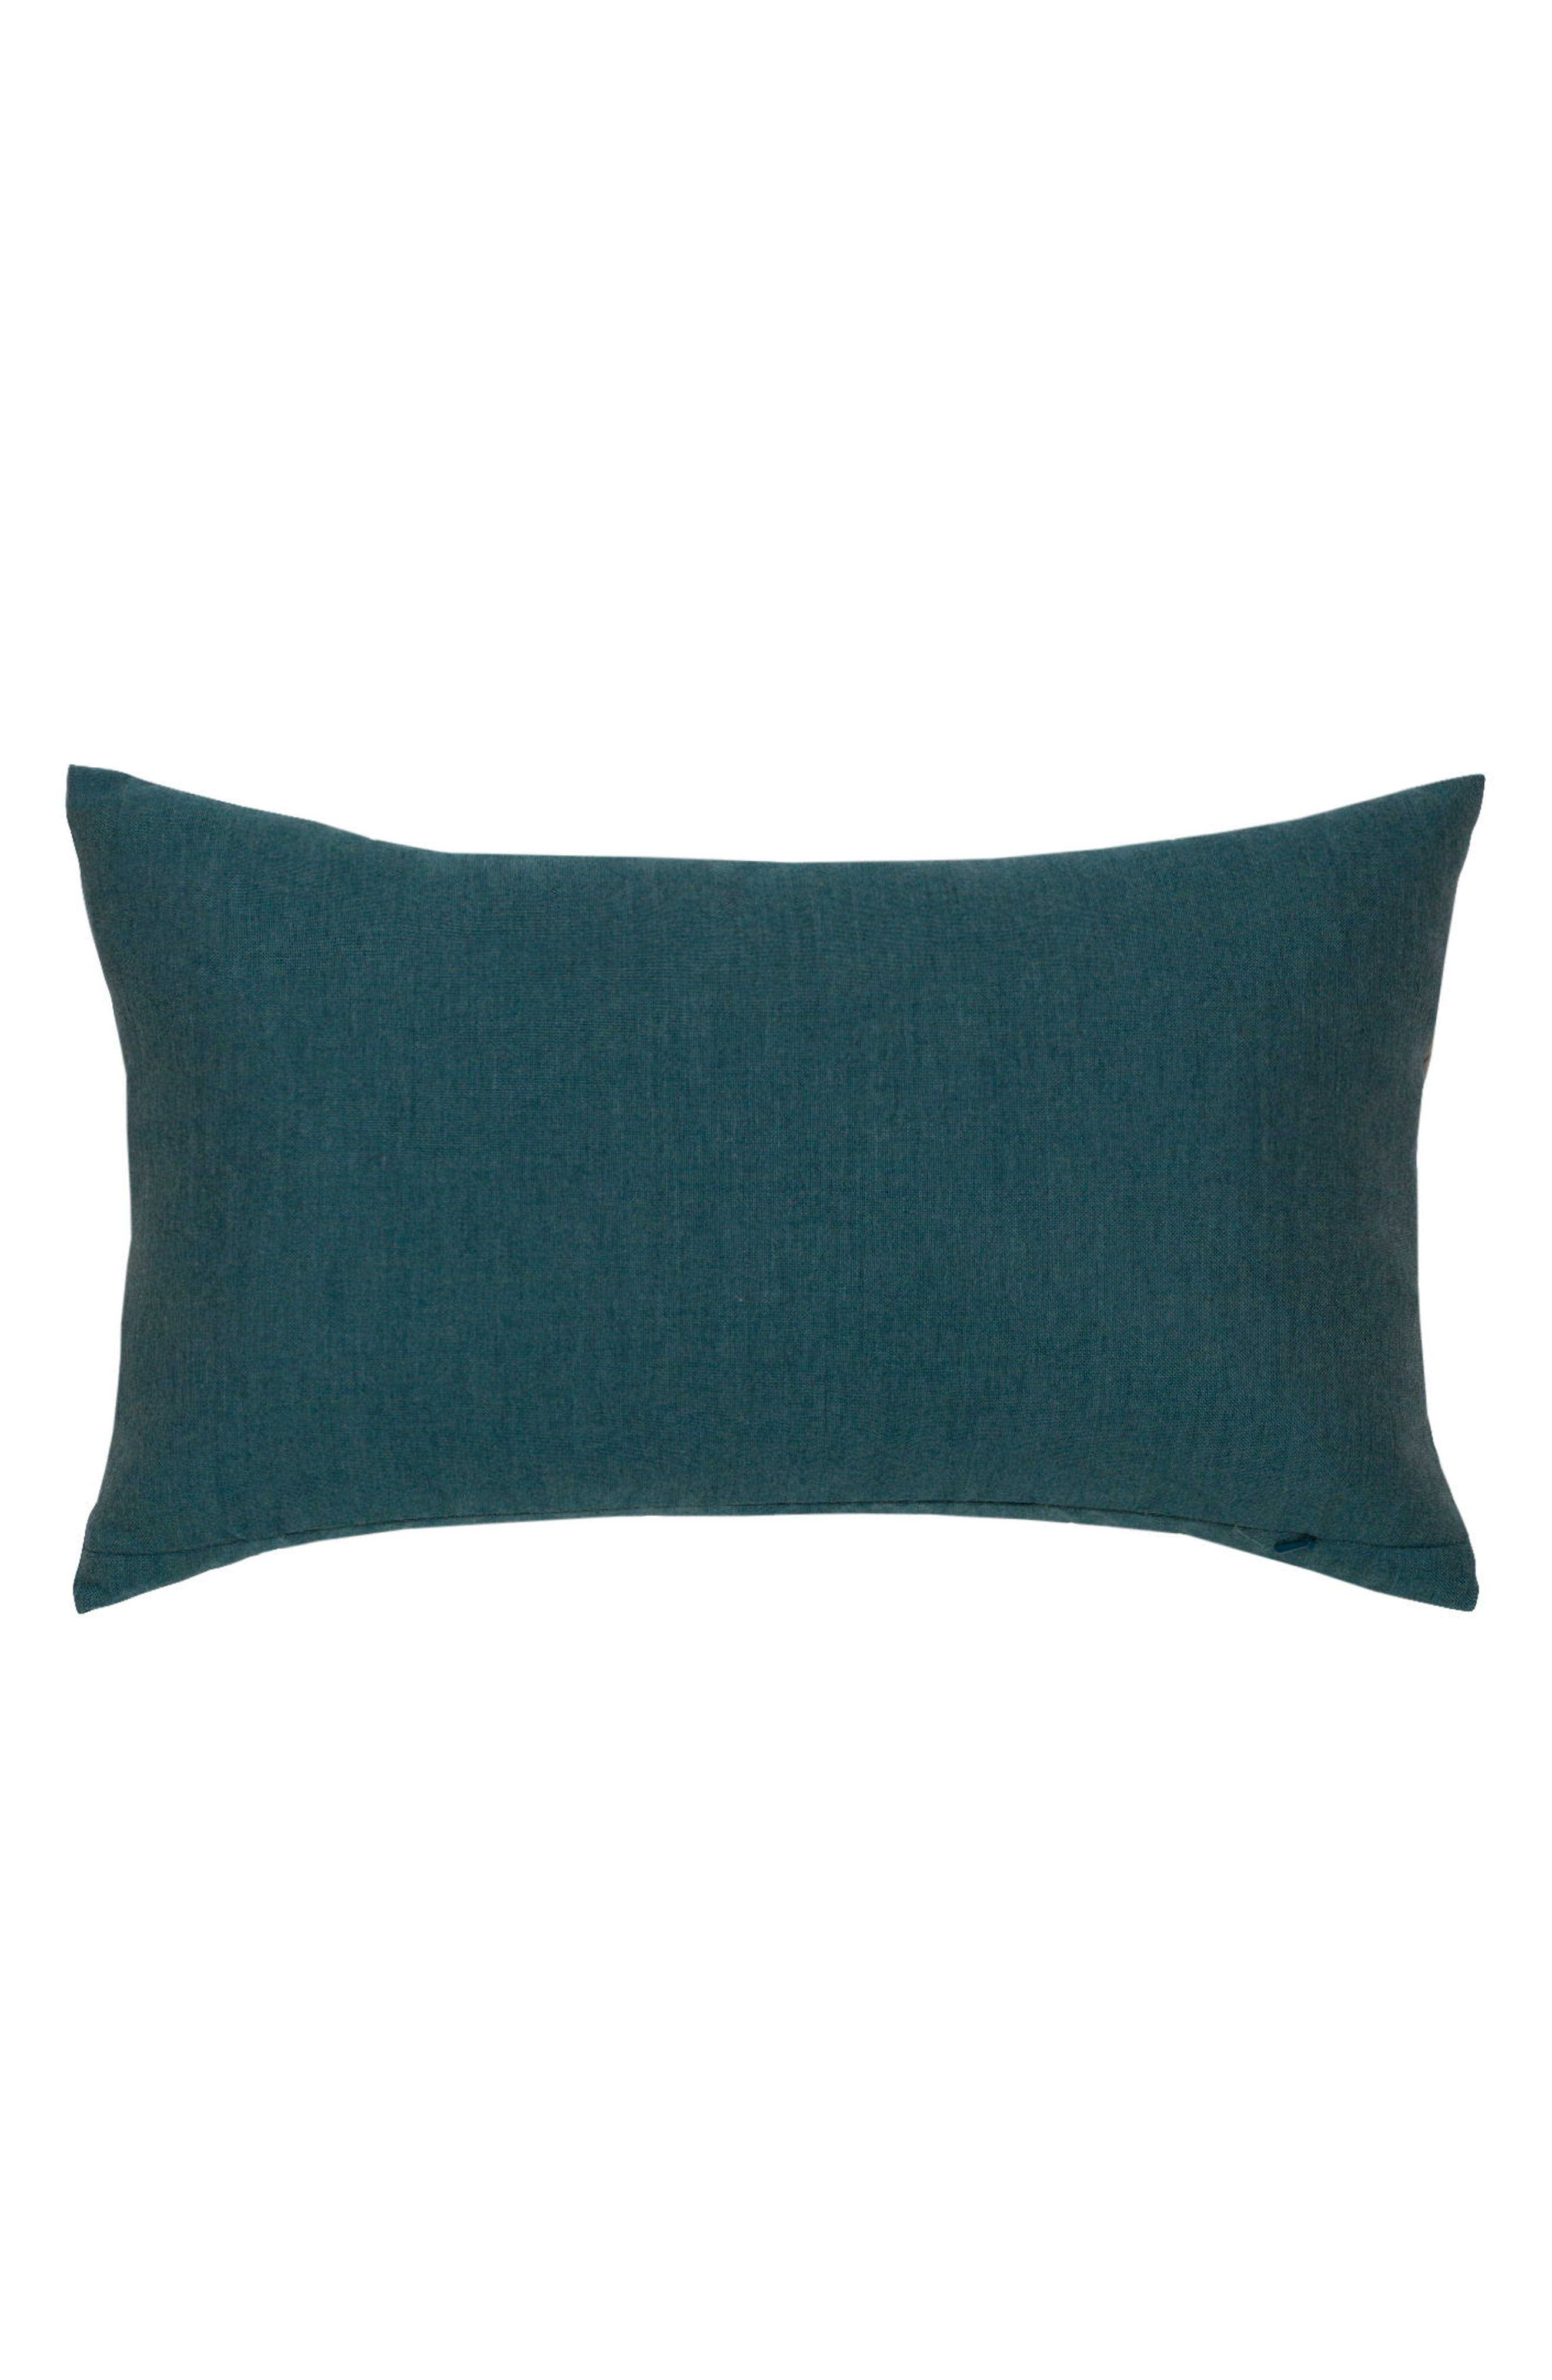 Lagoon Rope Lumbar Pillow,                             Alternate thumbnail 2, color,                             BLUE